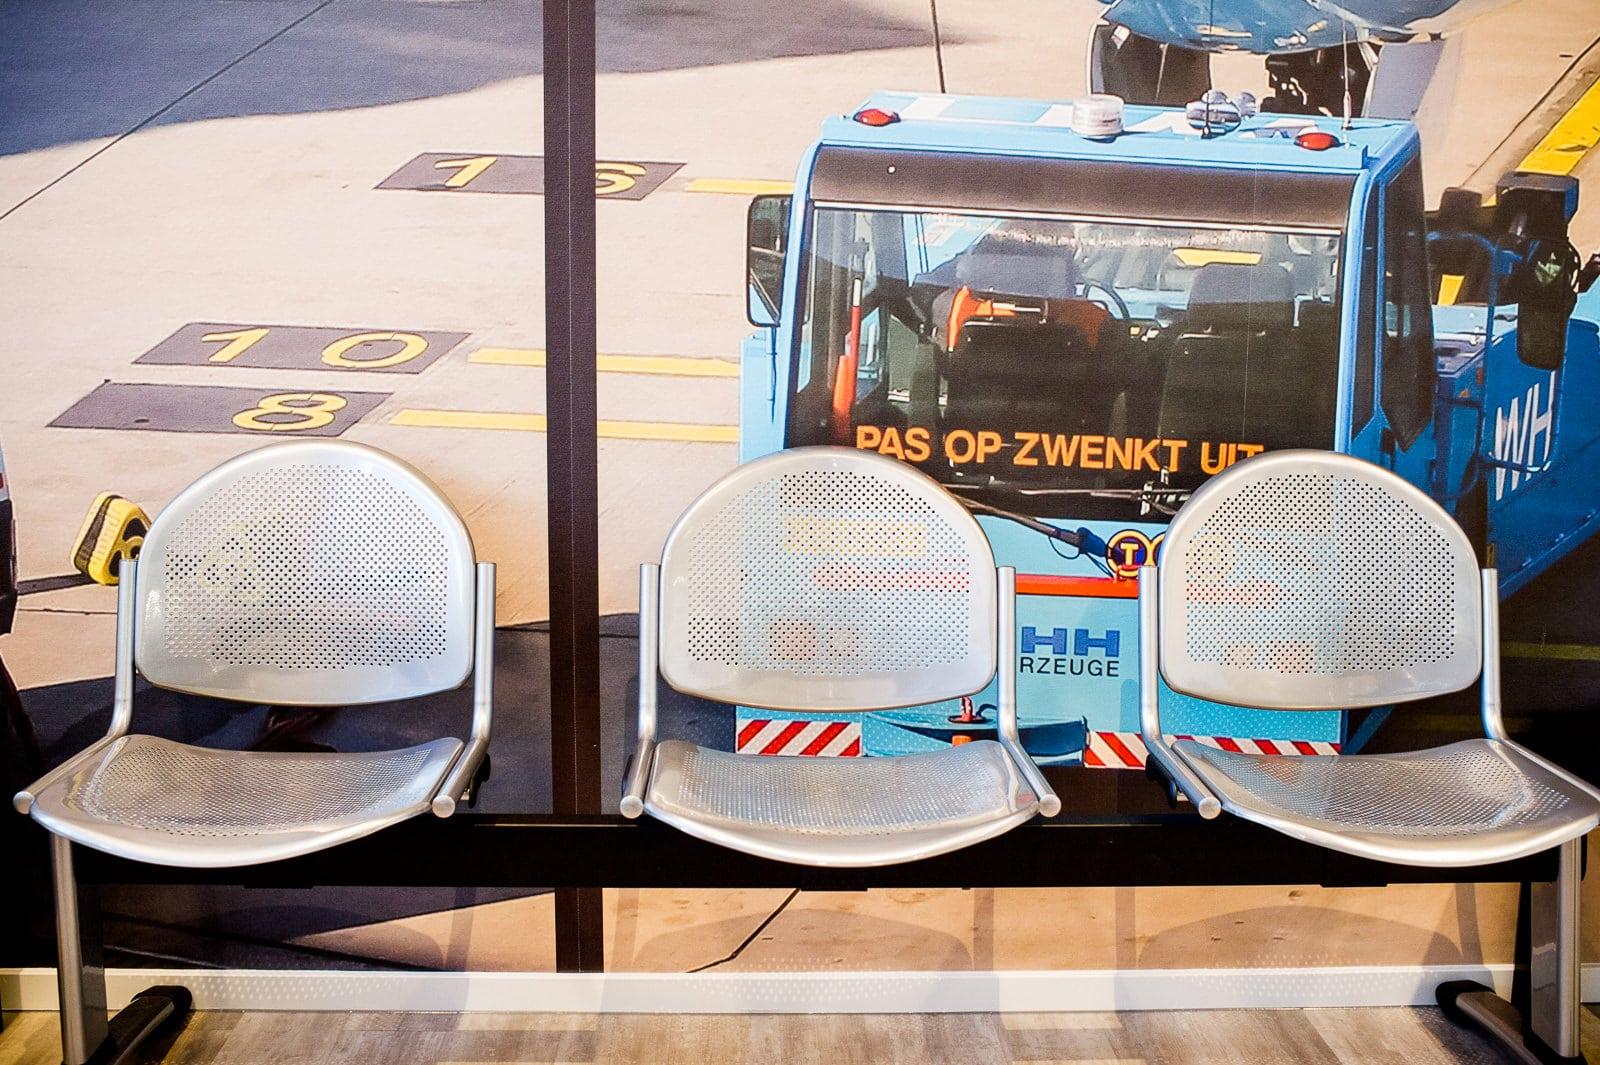 stoelen-wachtruimte-airportho-utrecht